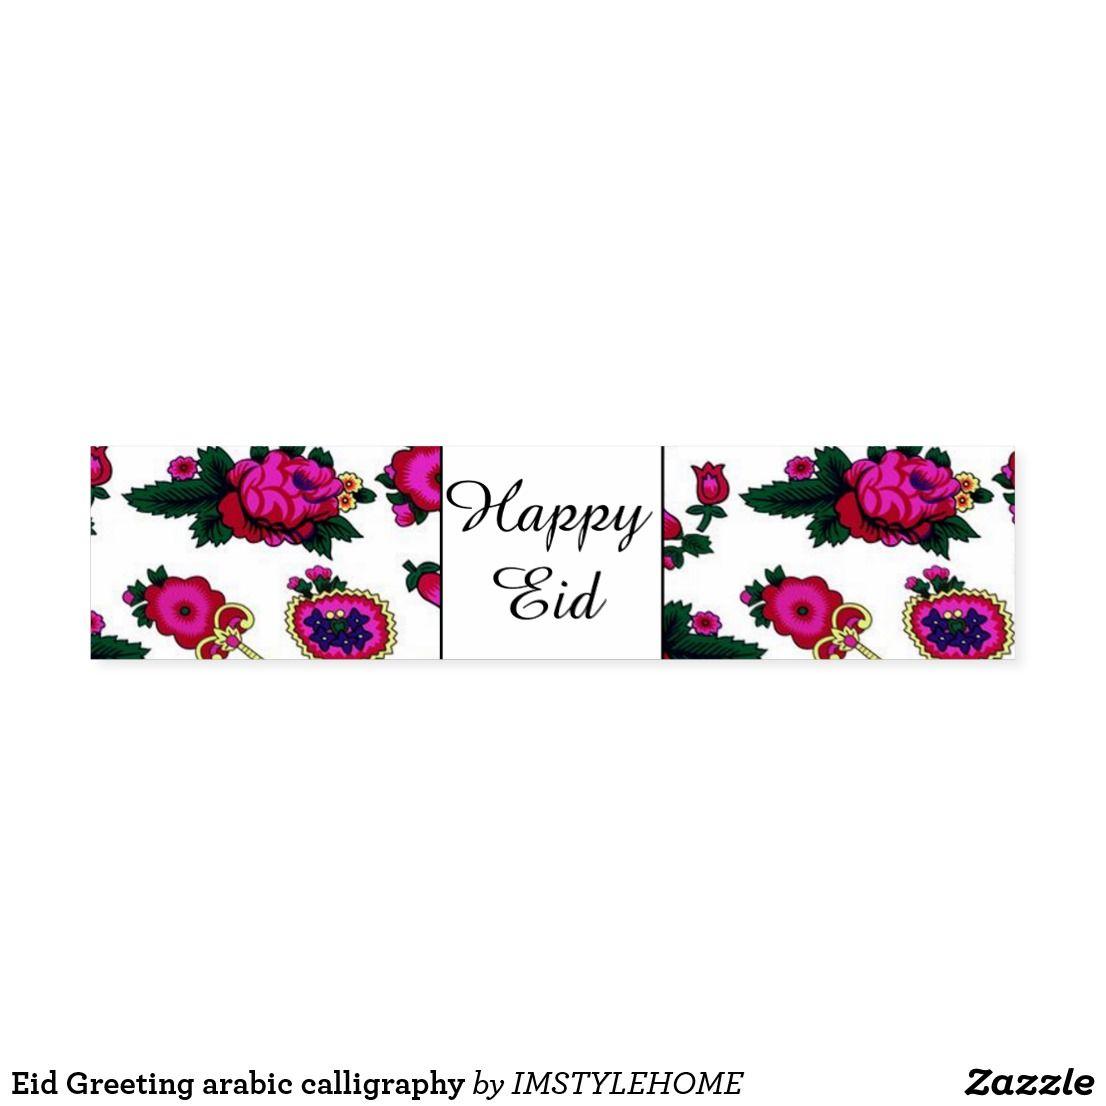 eid greeting arabic calligraphy napkin band  zazzle